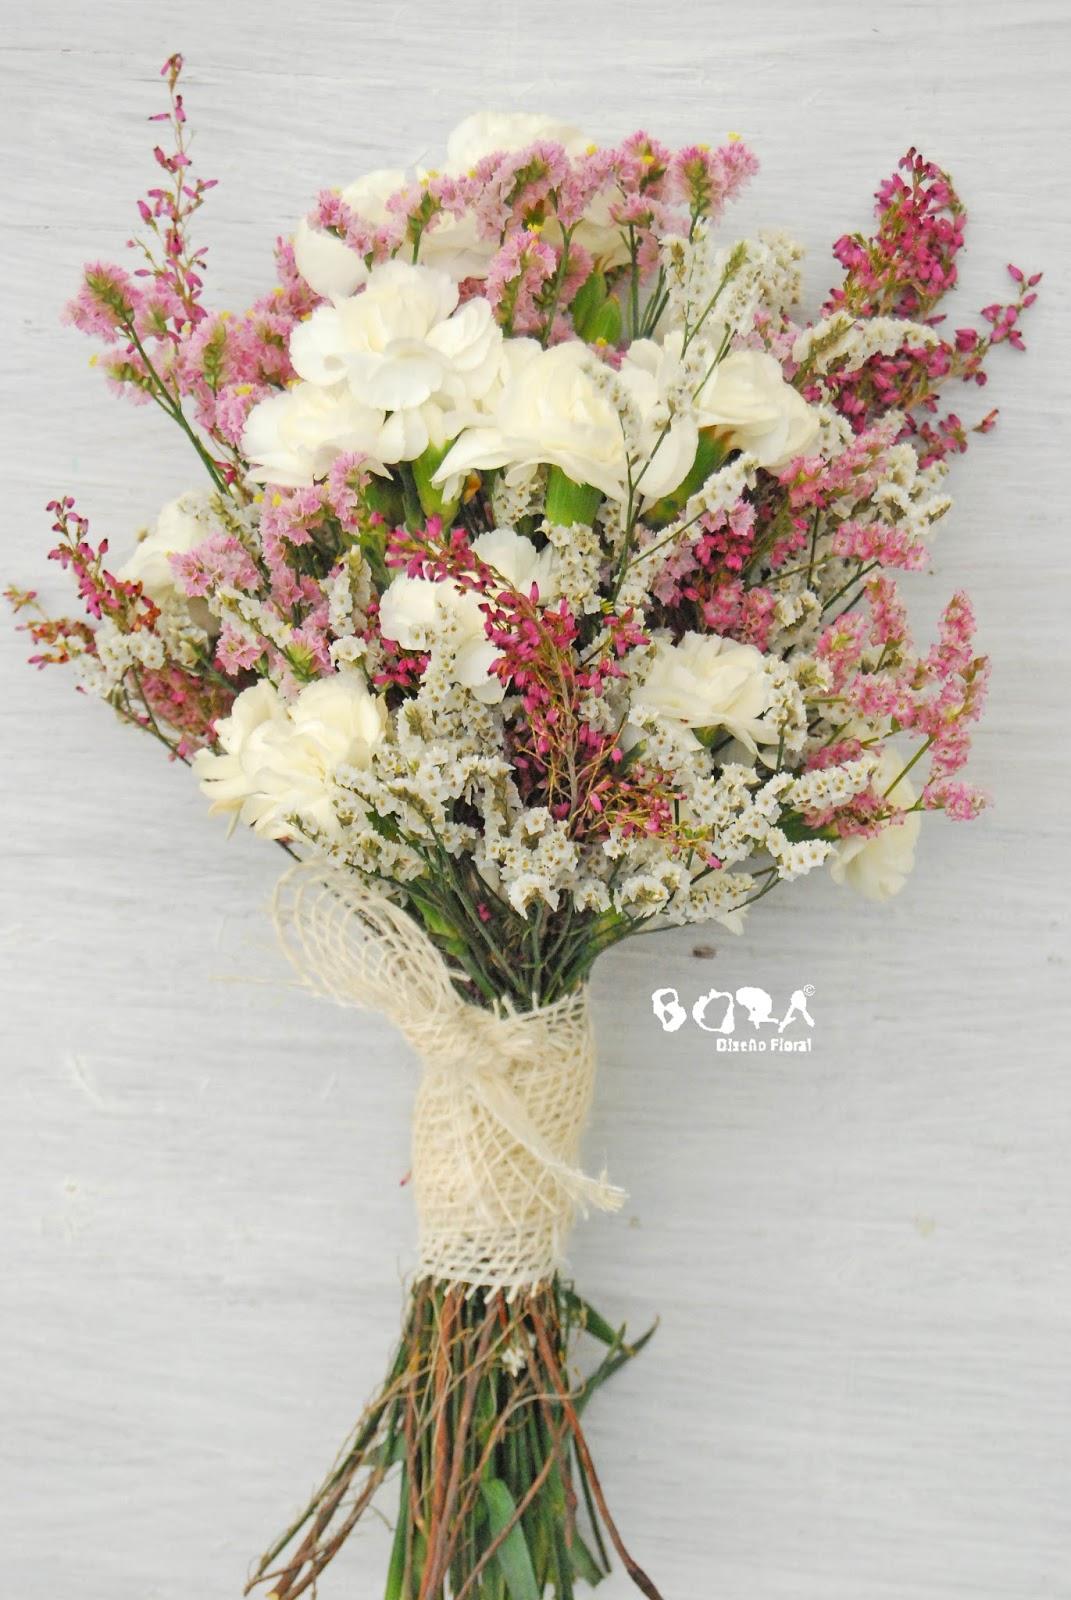 limonium brezo y clavelina - Ramos De Flores Silvestres